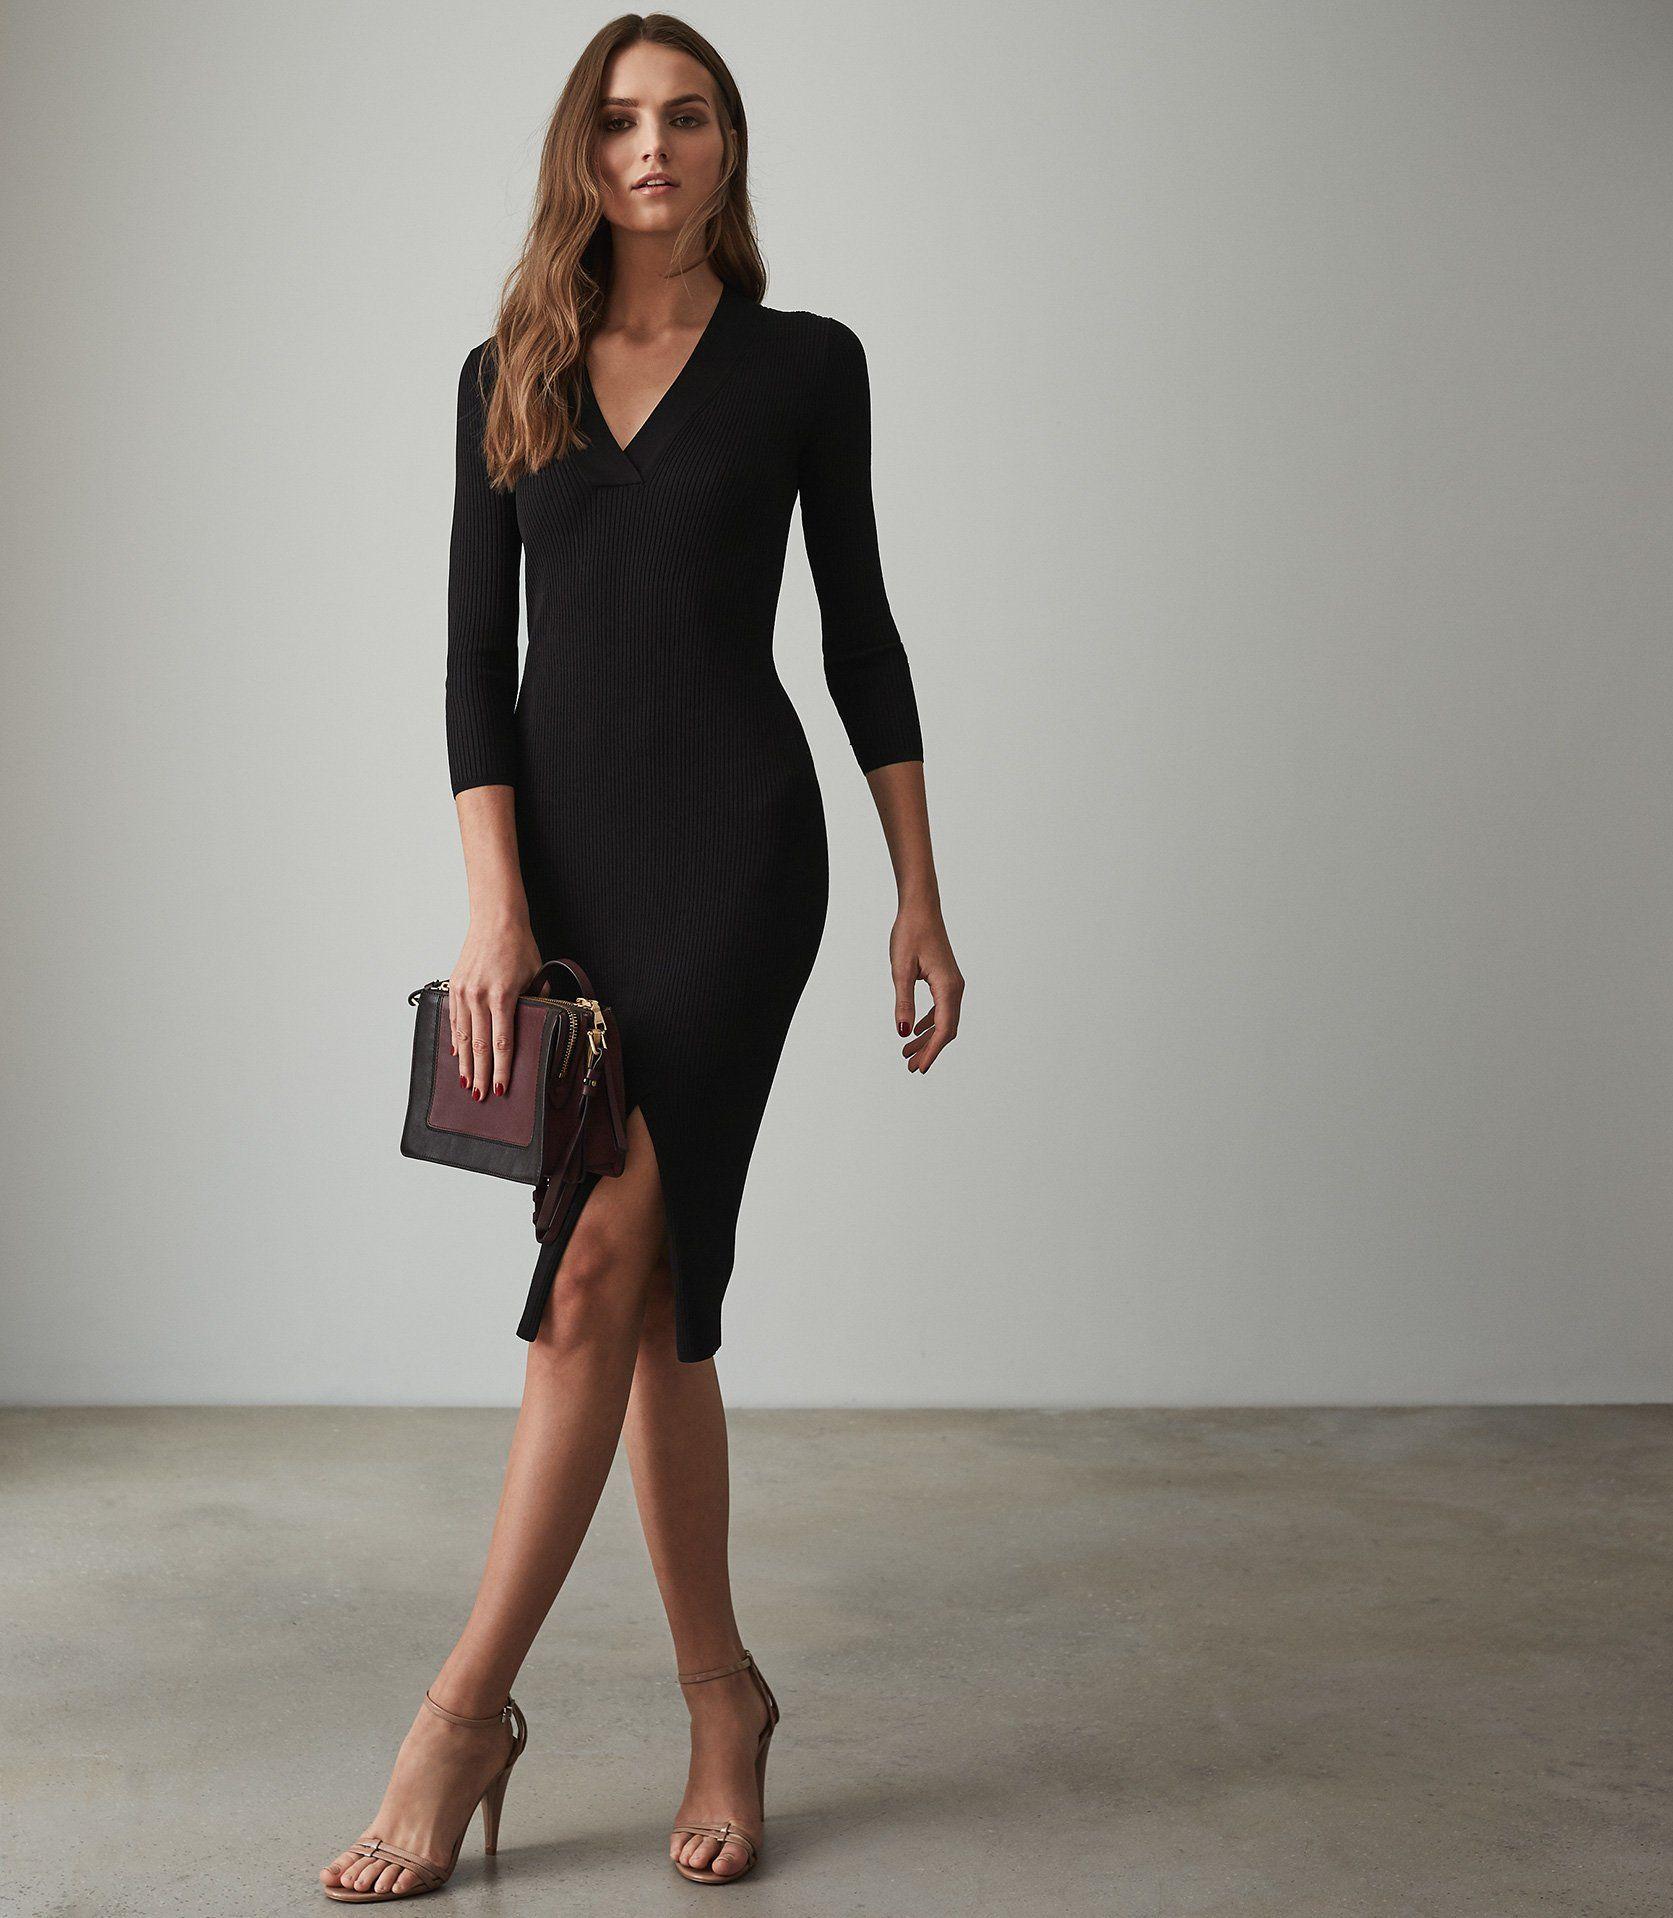 a17b66d70f Aletti V-Neck Knitted Dress - REISS